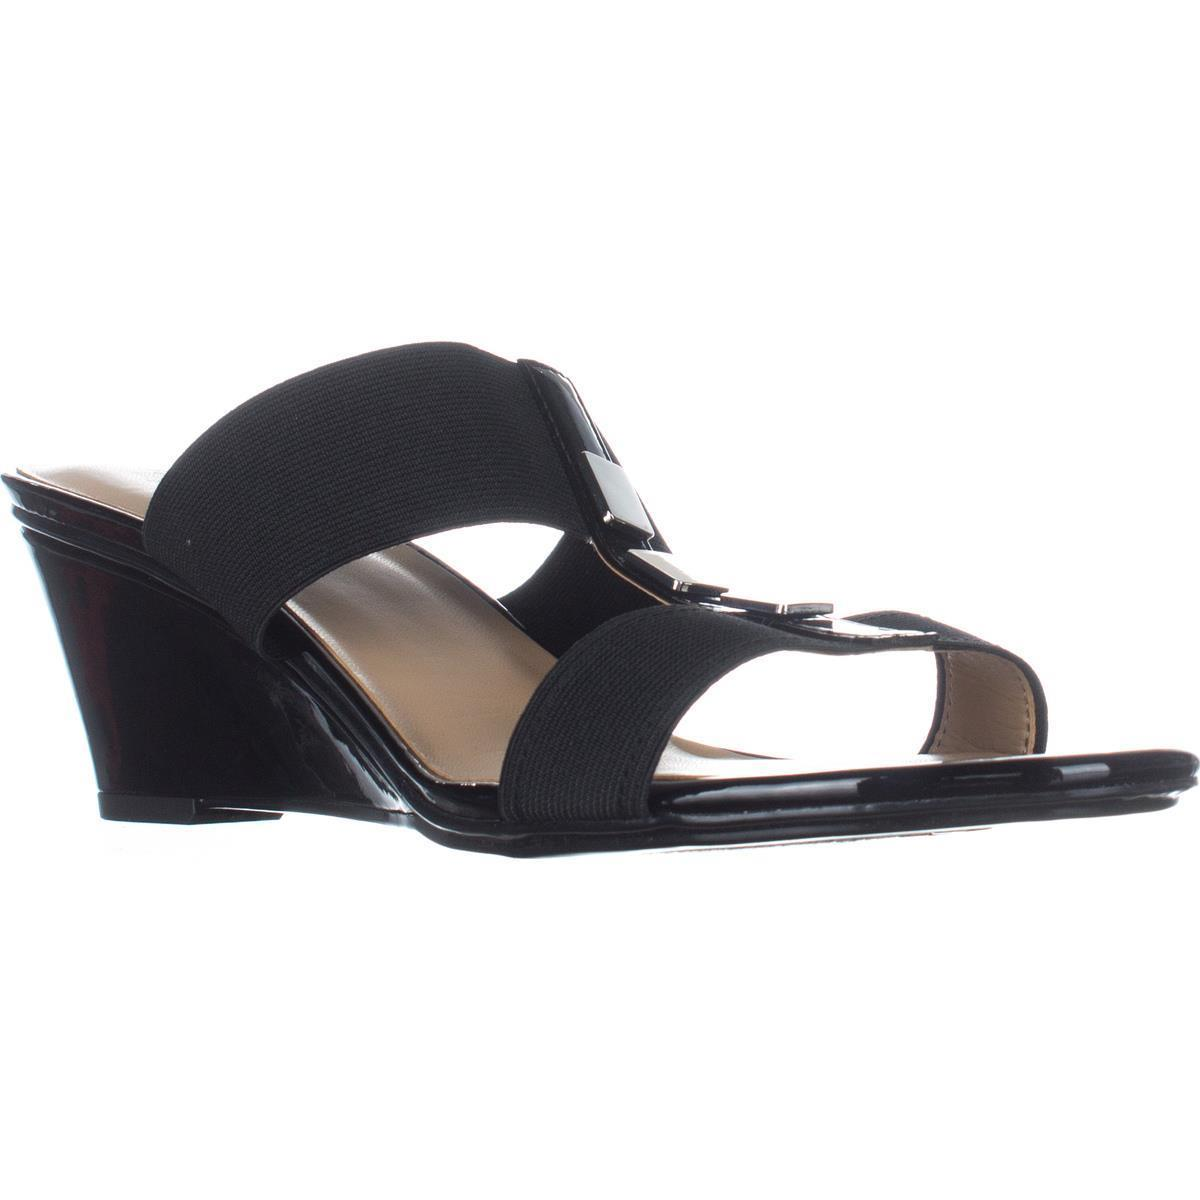 Womens Naturalizer Hayden T-Strap Wedge Sandals, Black by Naturalizer